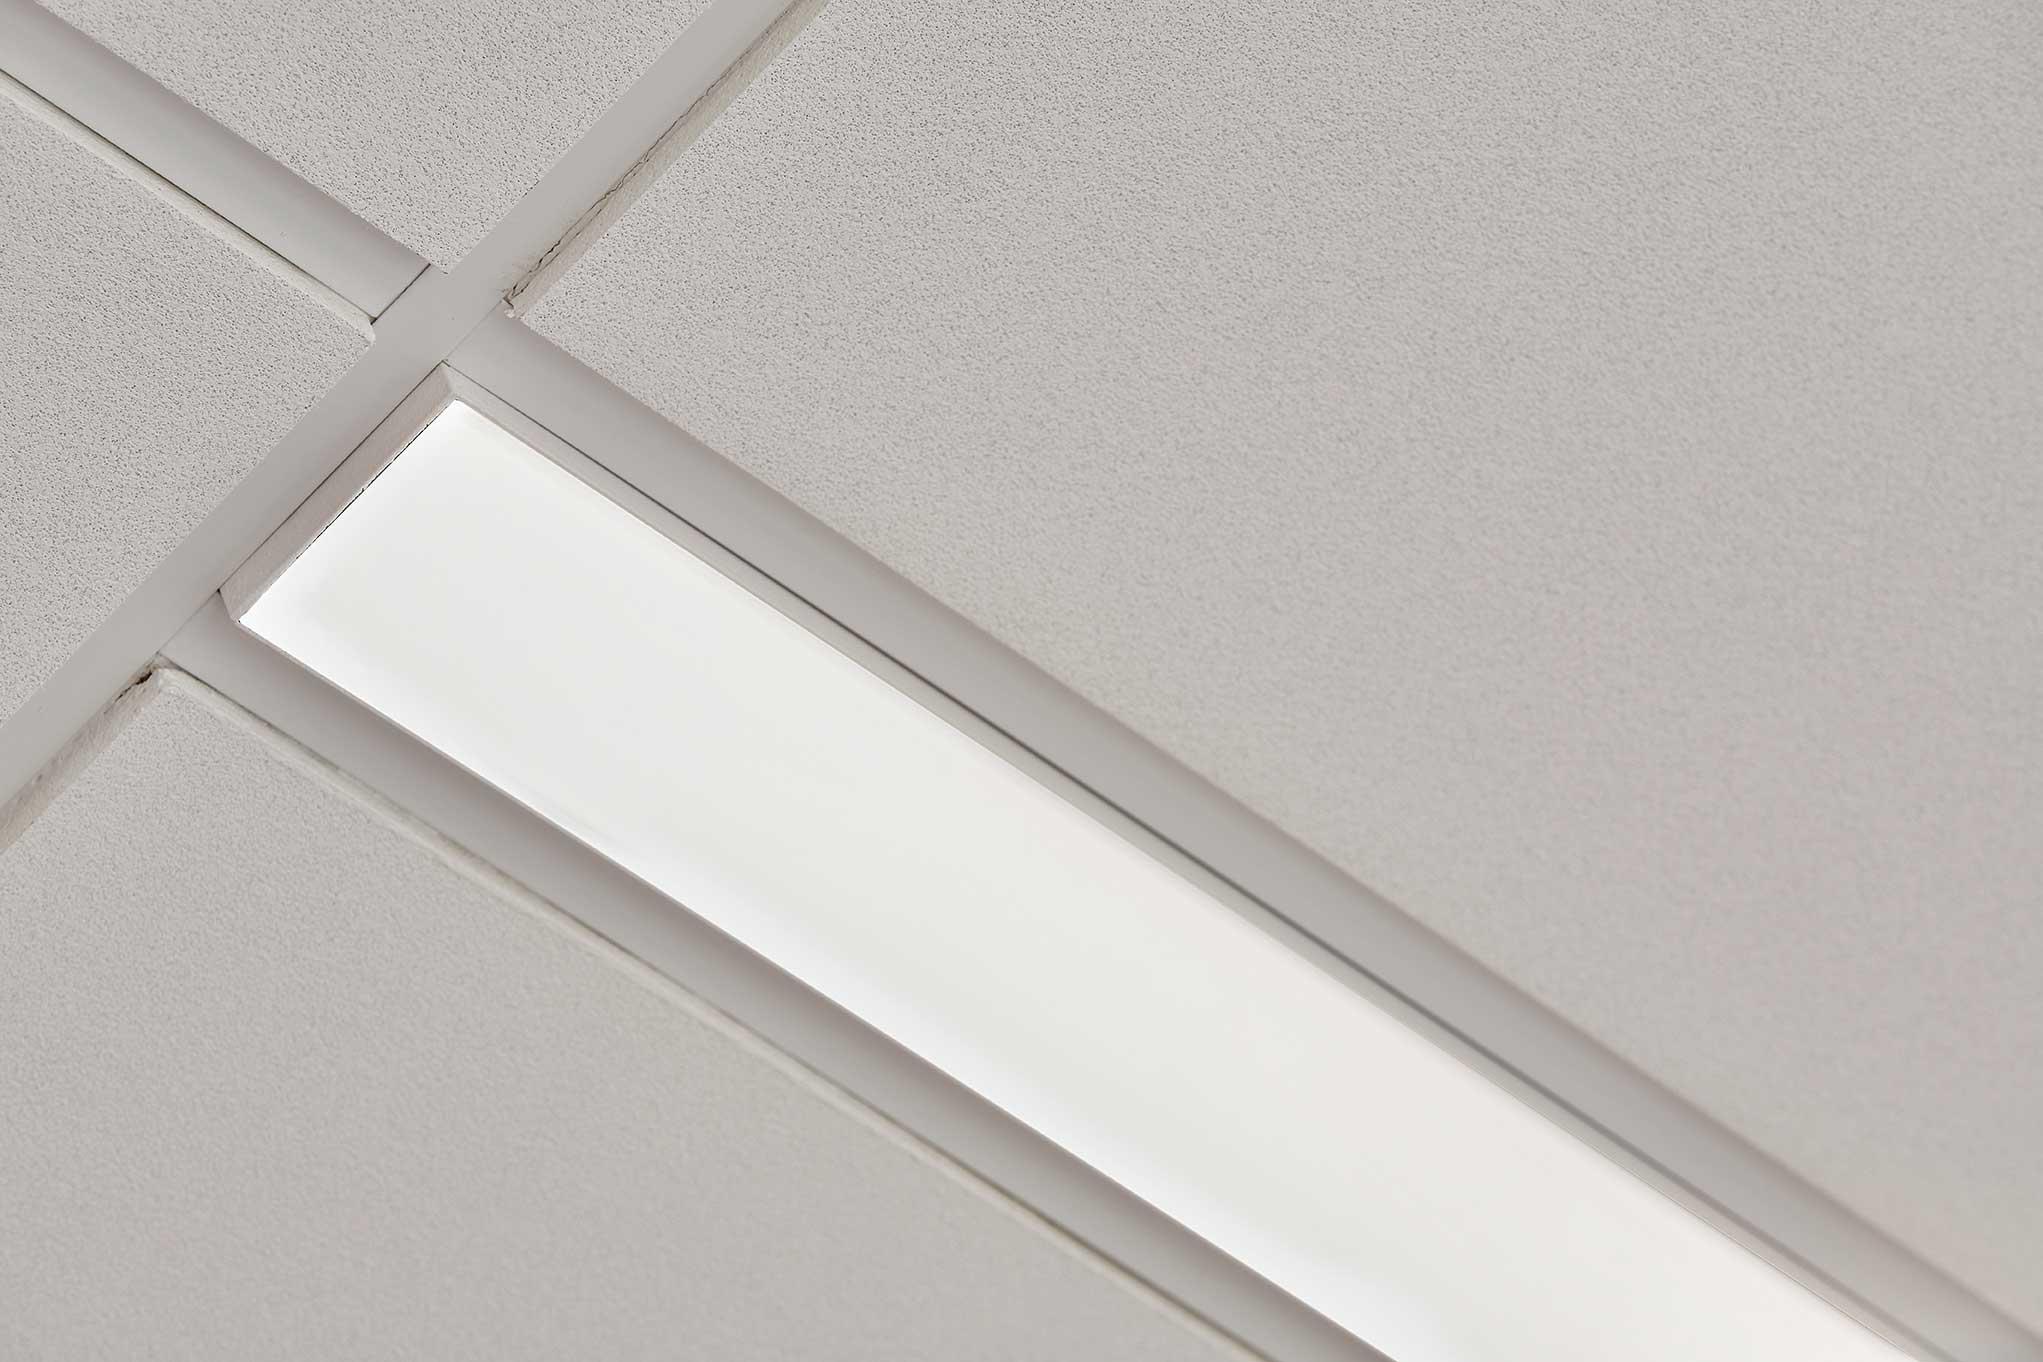 Matric Recessed Frameless M1 lampe indbygget i loftet nærbillede - Luminex